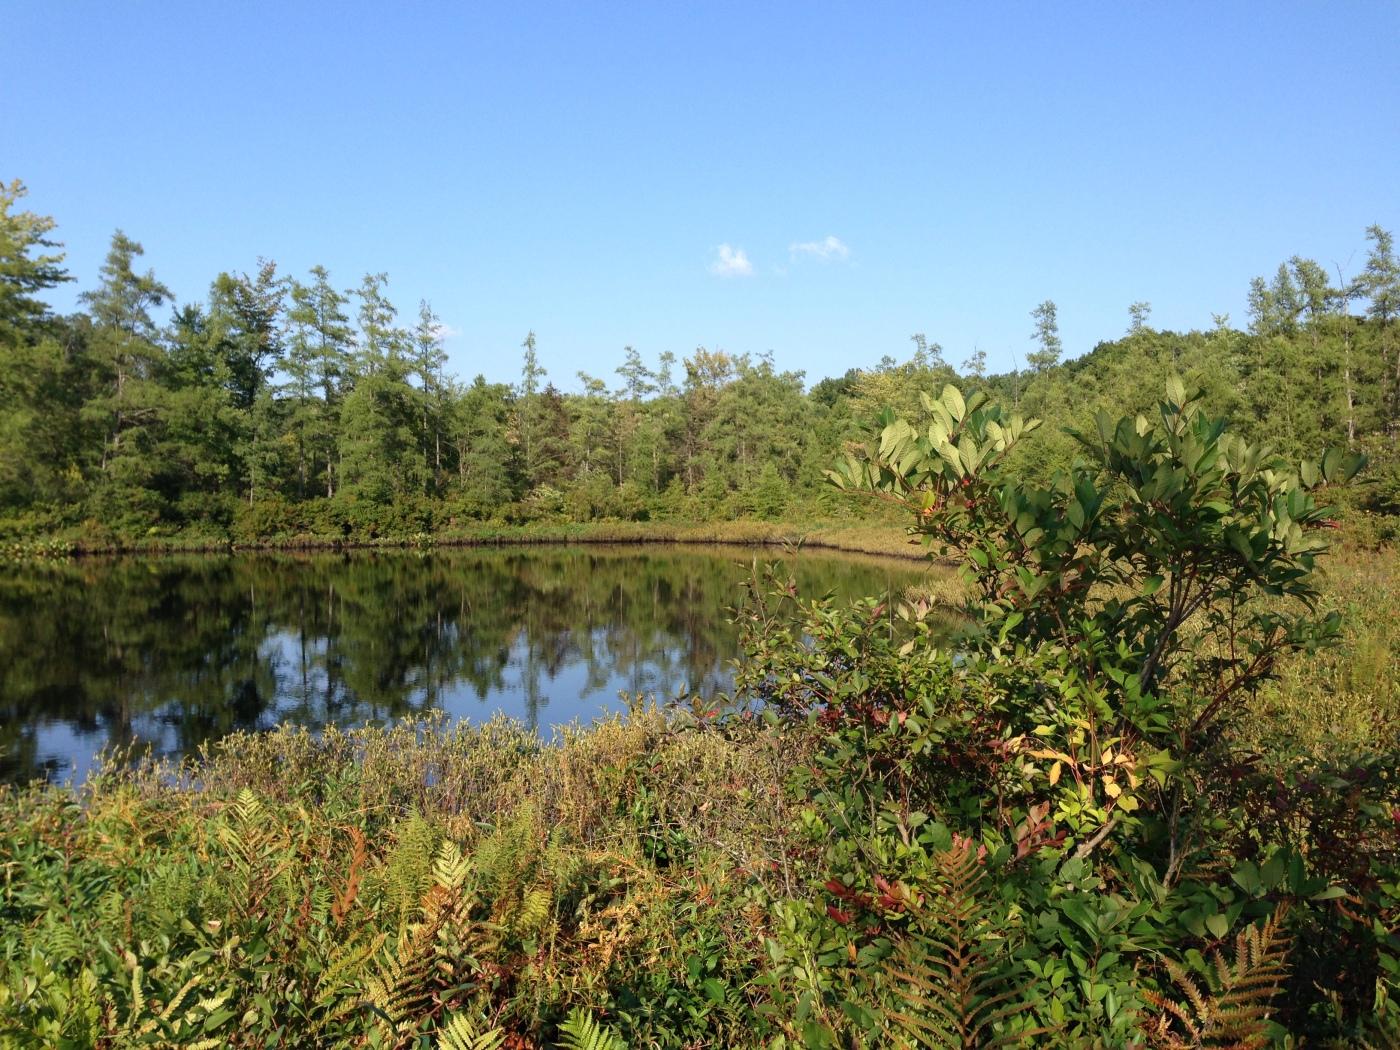 Triangle_Lake_Bog_State_Nature_Preserve